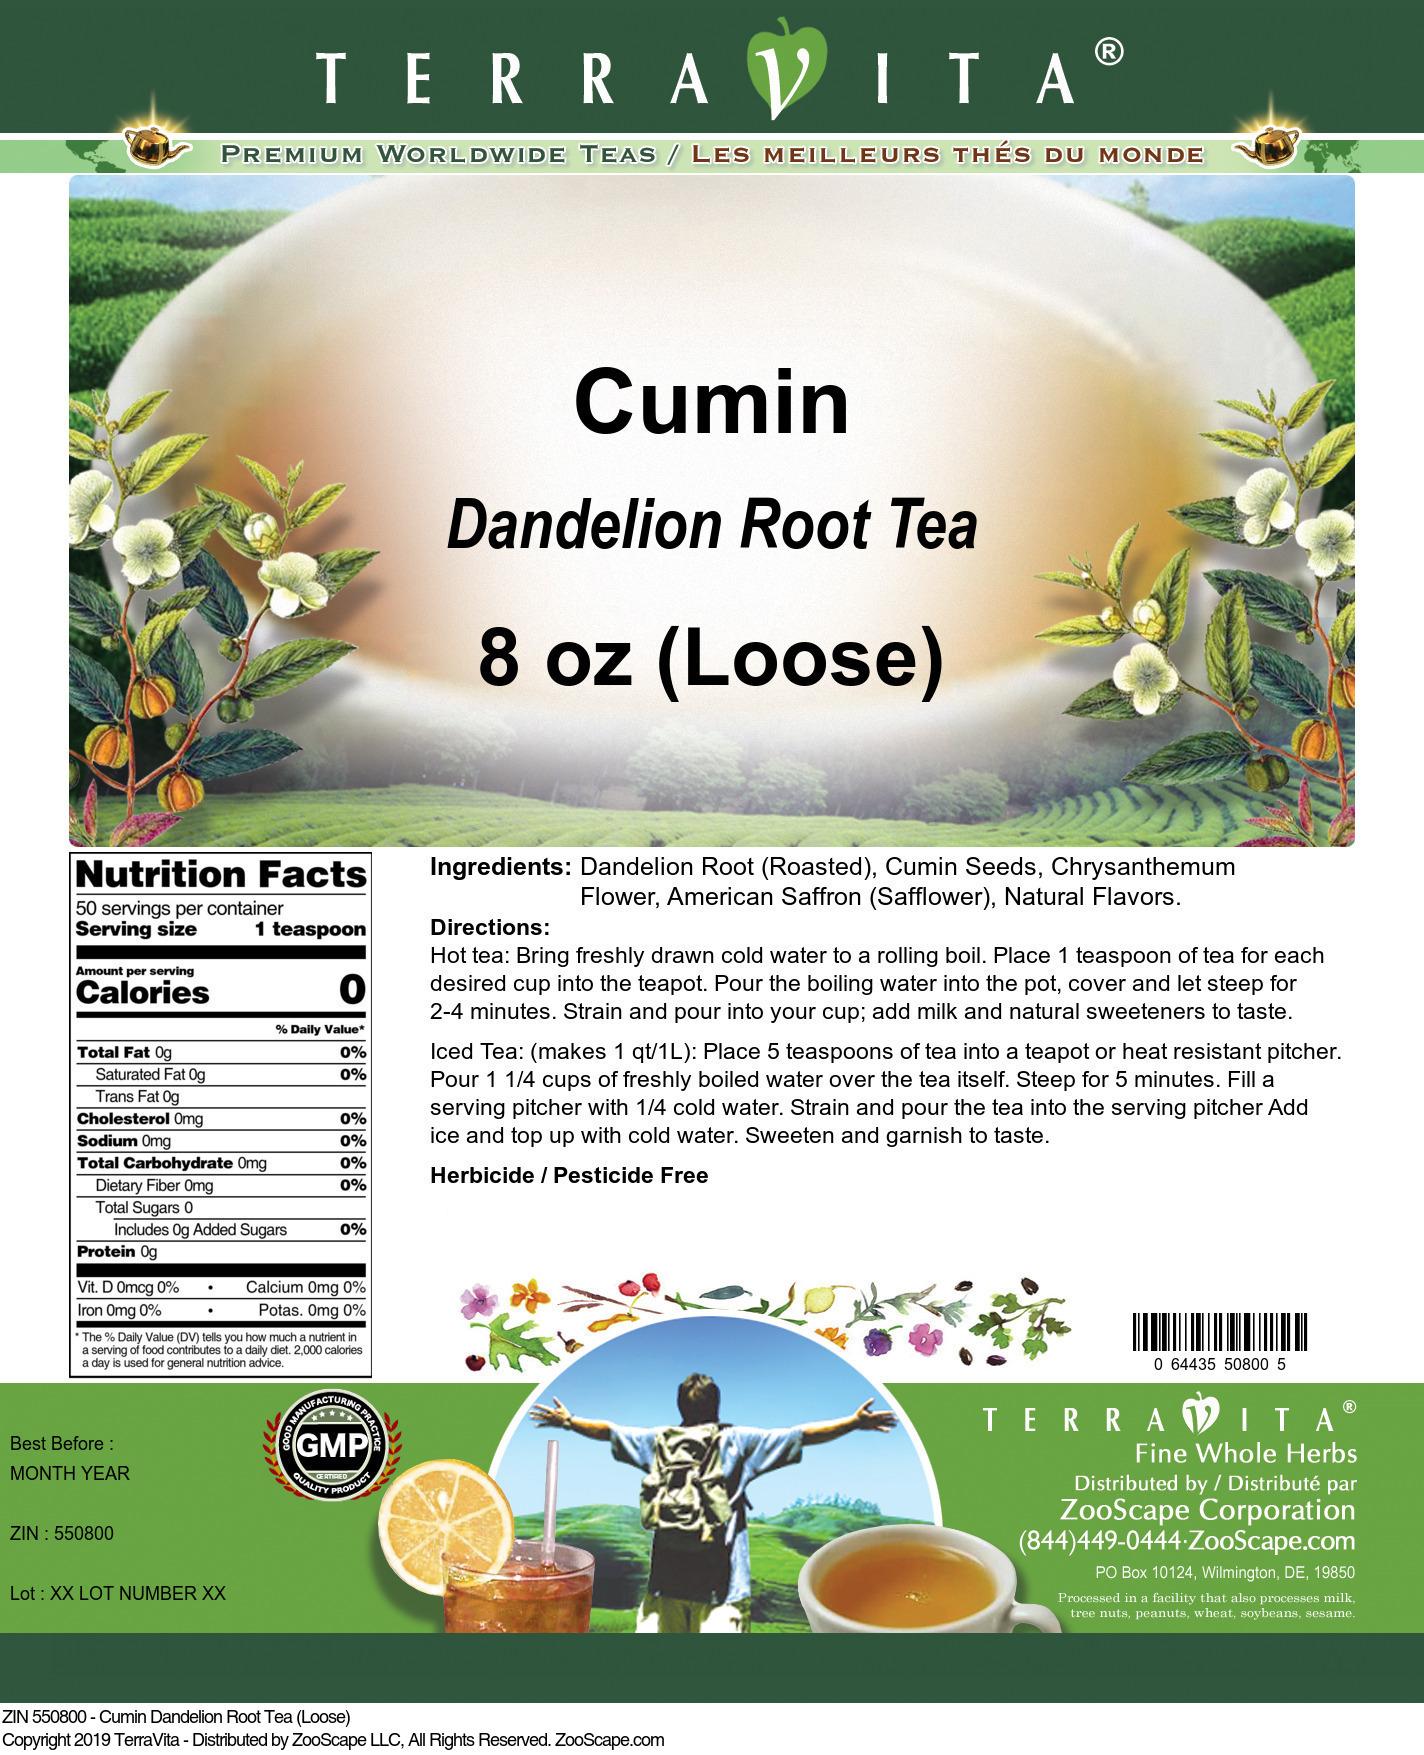 Cumin Dandelion Root Tea (Loose)